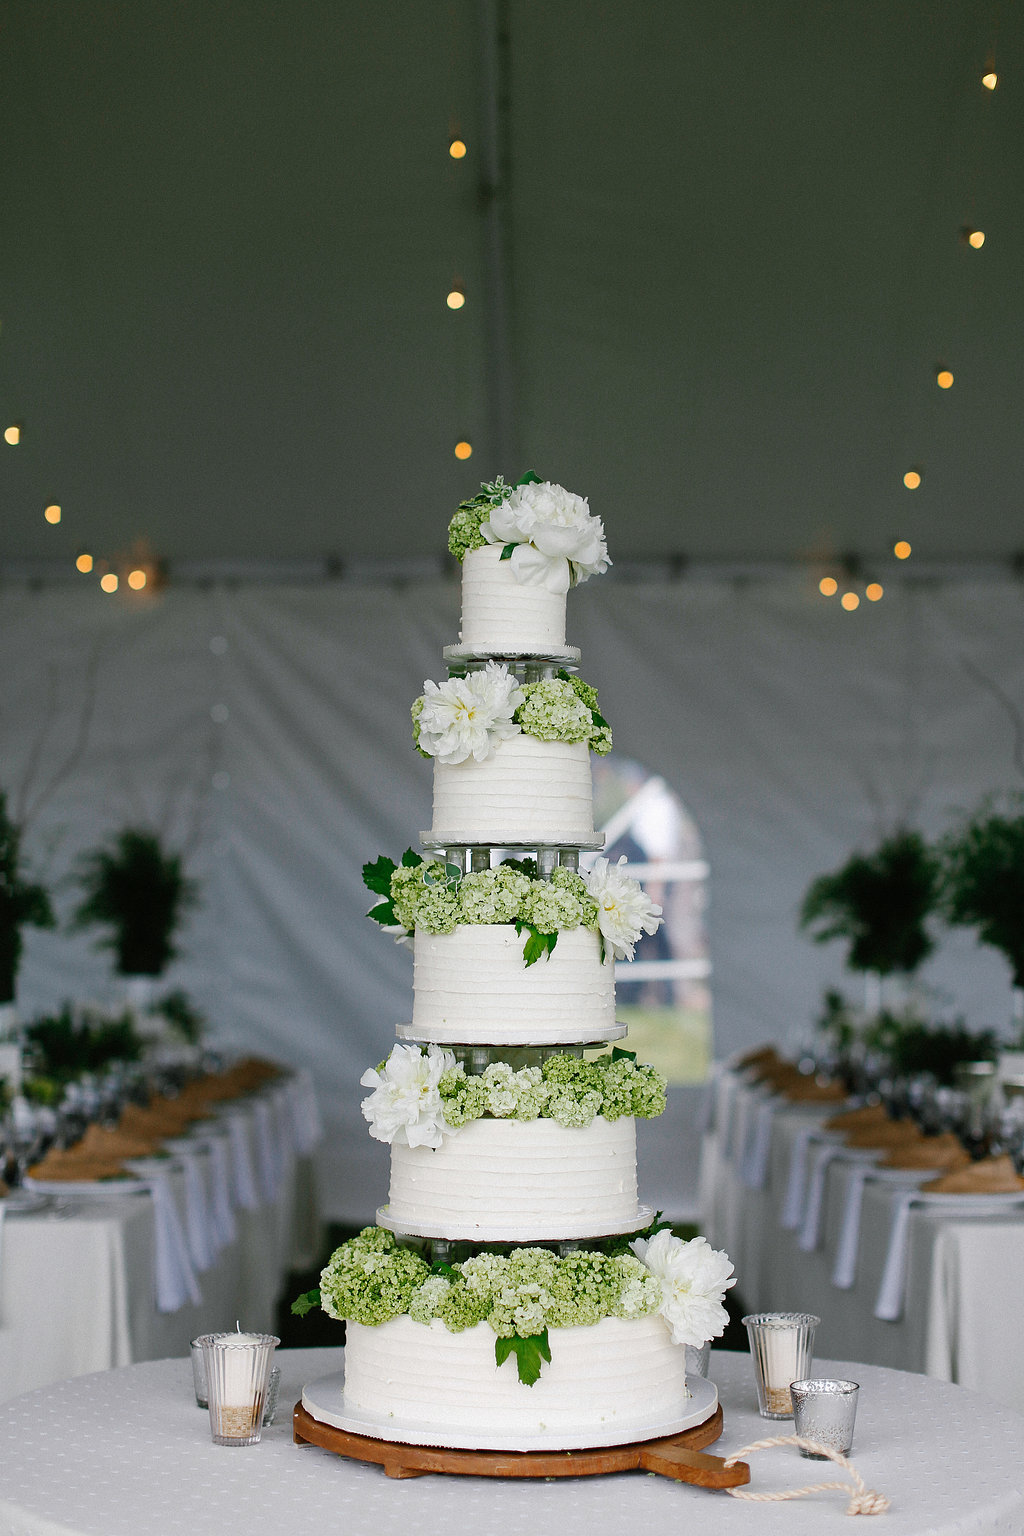 hydrangea-wedding-cake-horizontal-texture-columns-sweet-cheeks-lk-griffin-photo